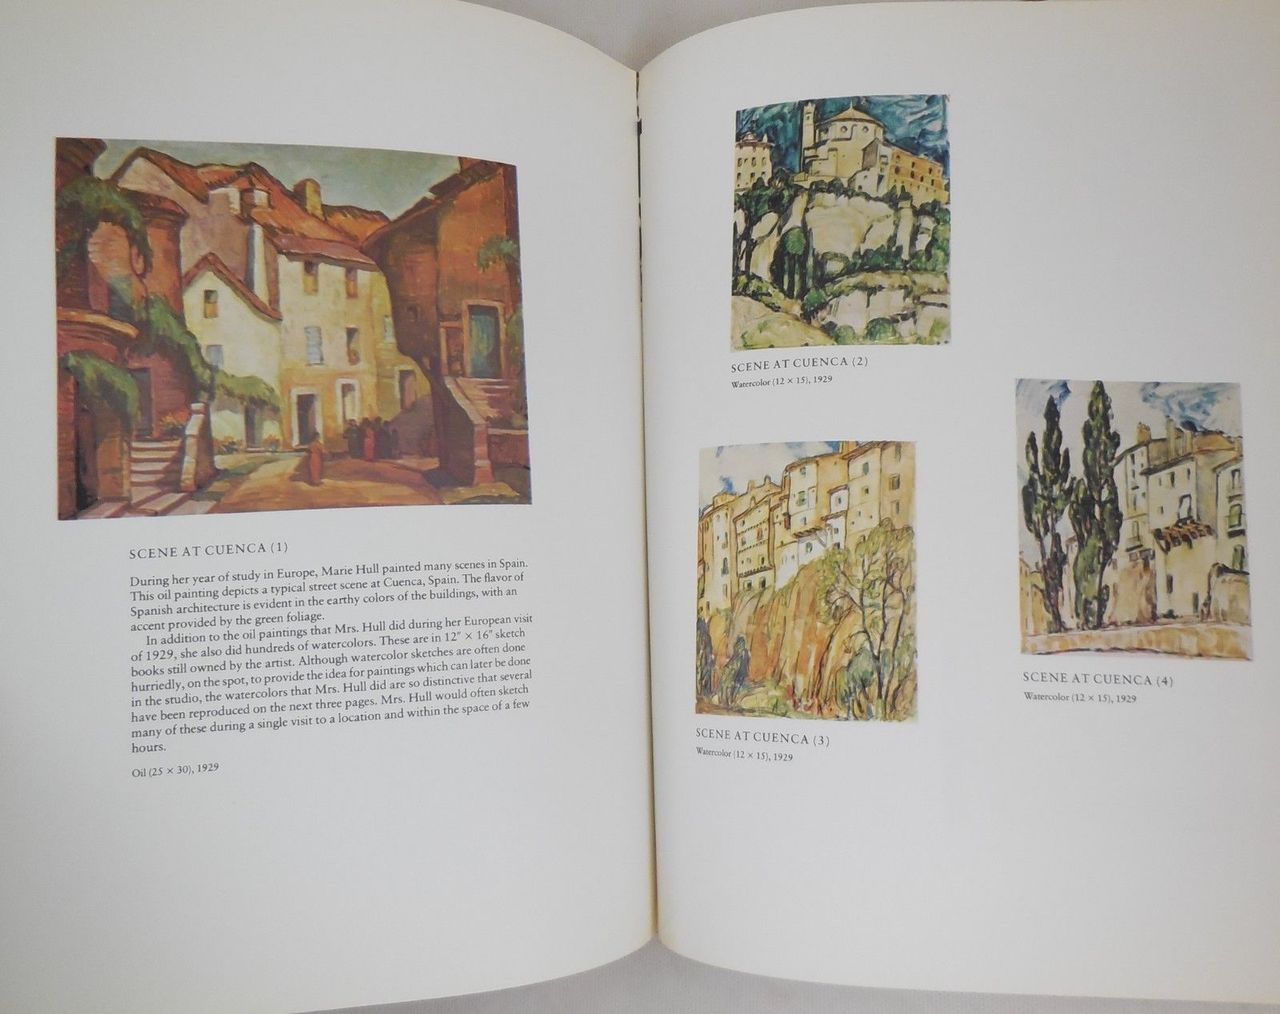 THE ART OF MARIE HULL - 1975 [1st Ed]